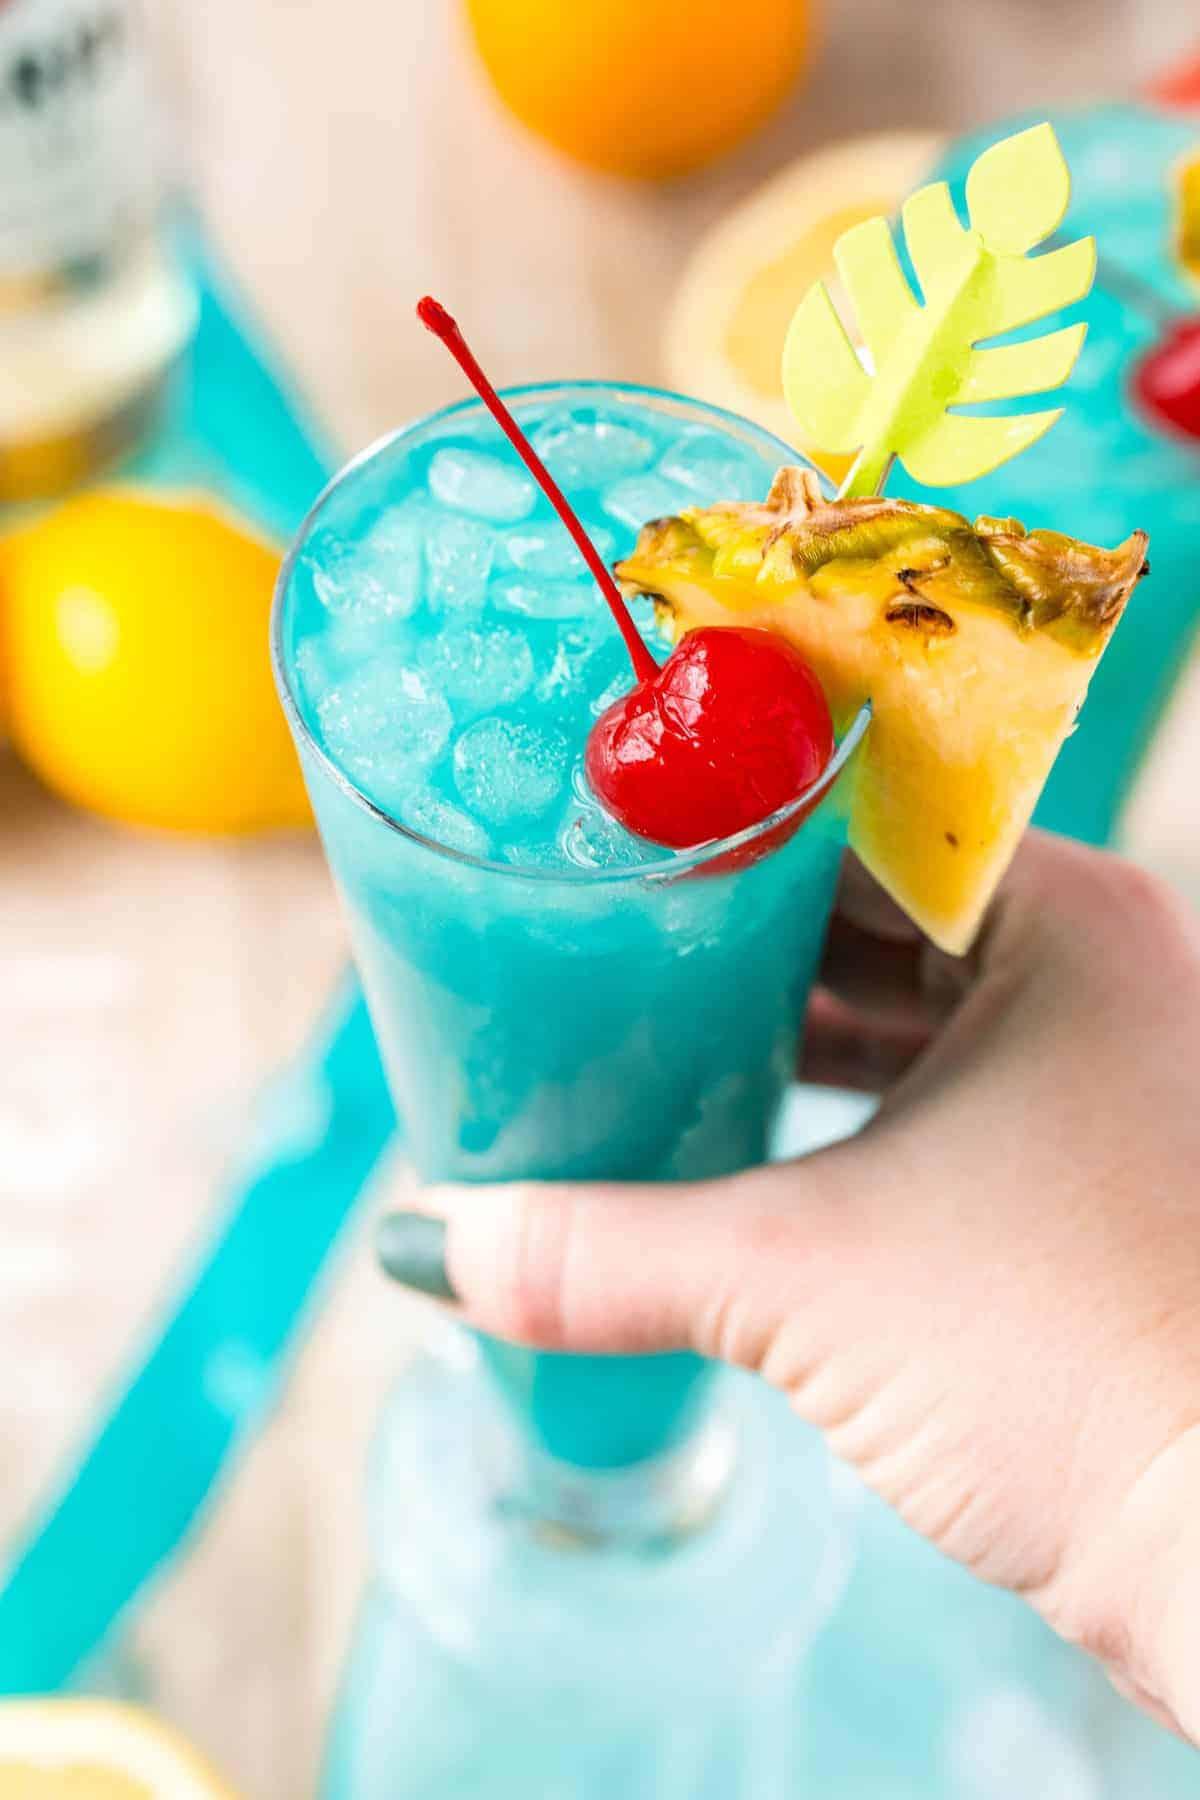 Hand holding a festive bright blue mermaid lemonade.